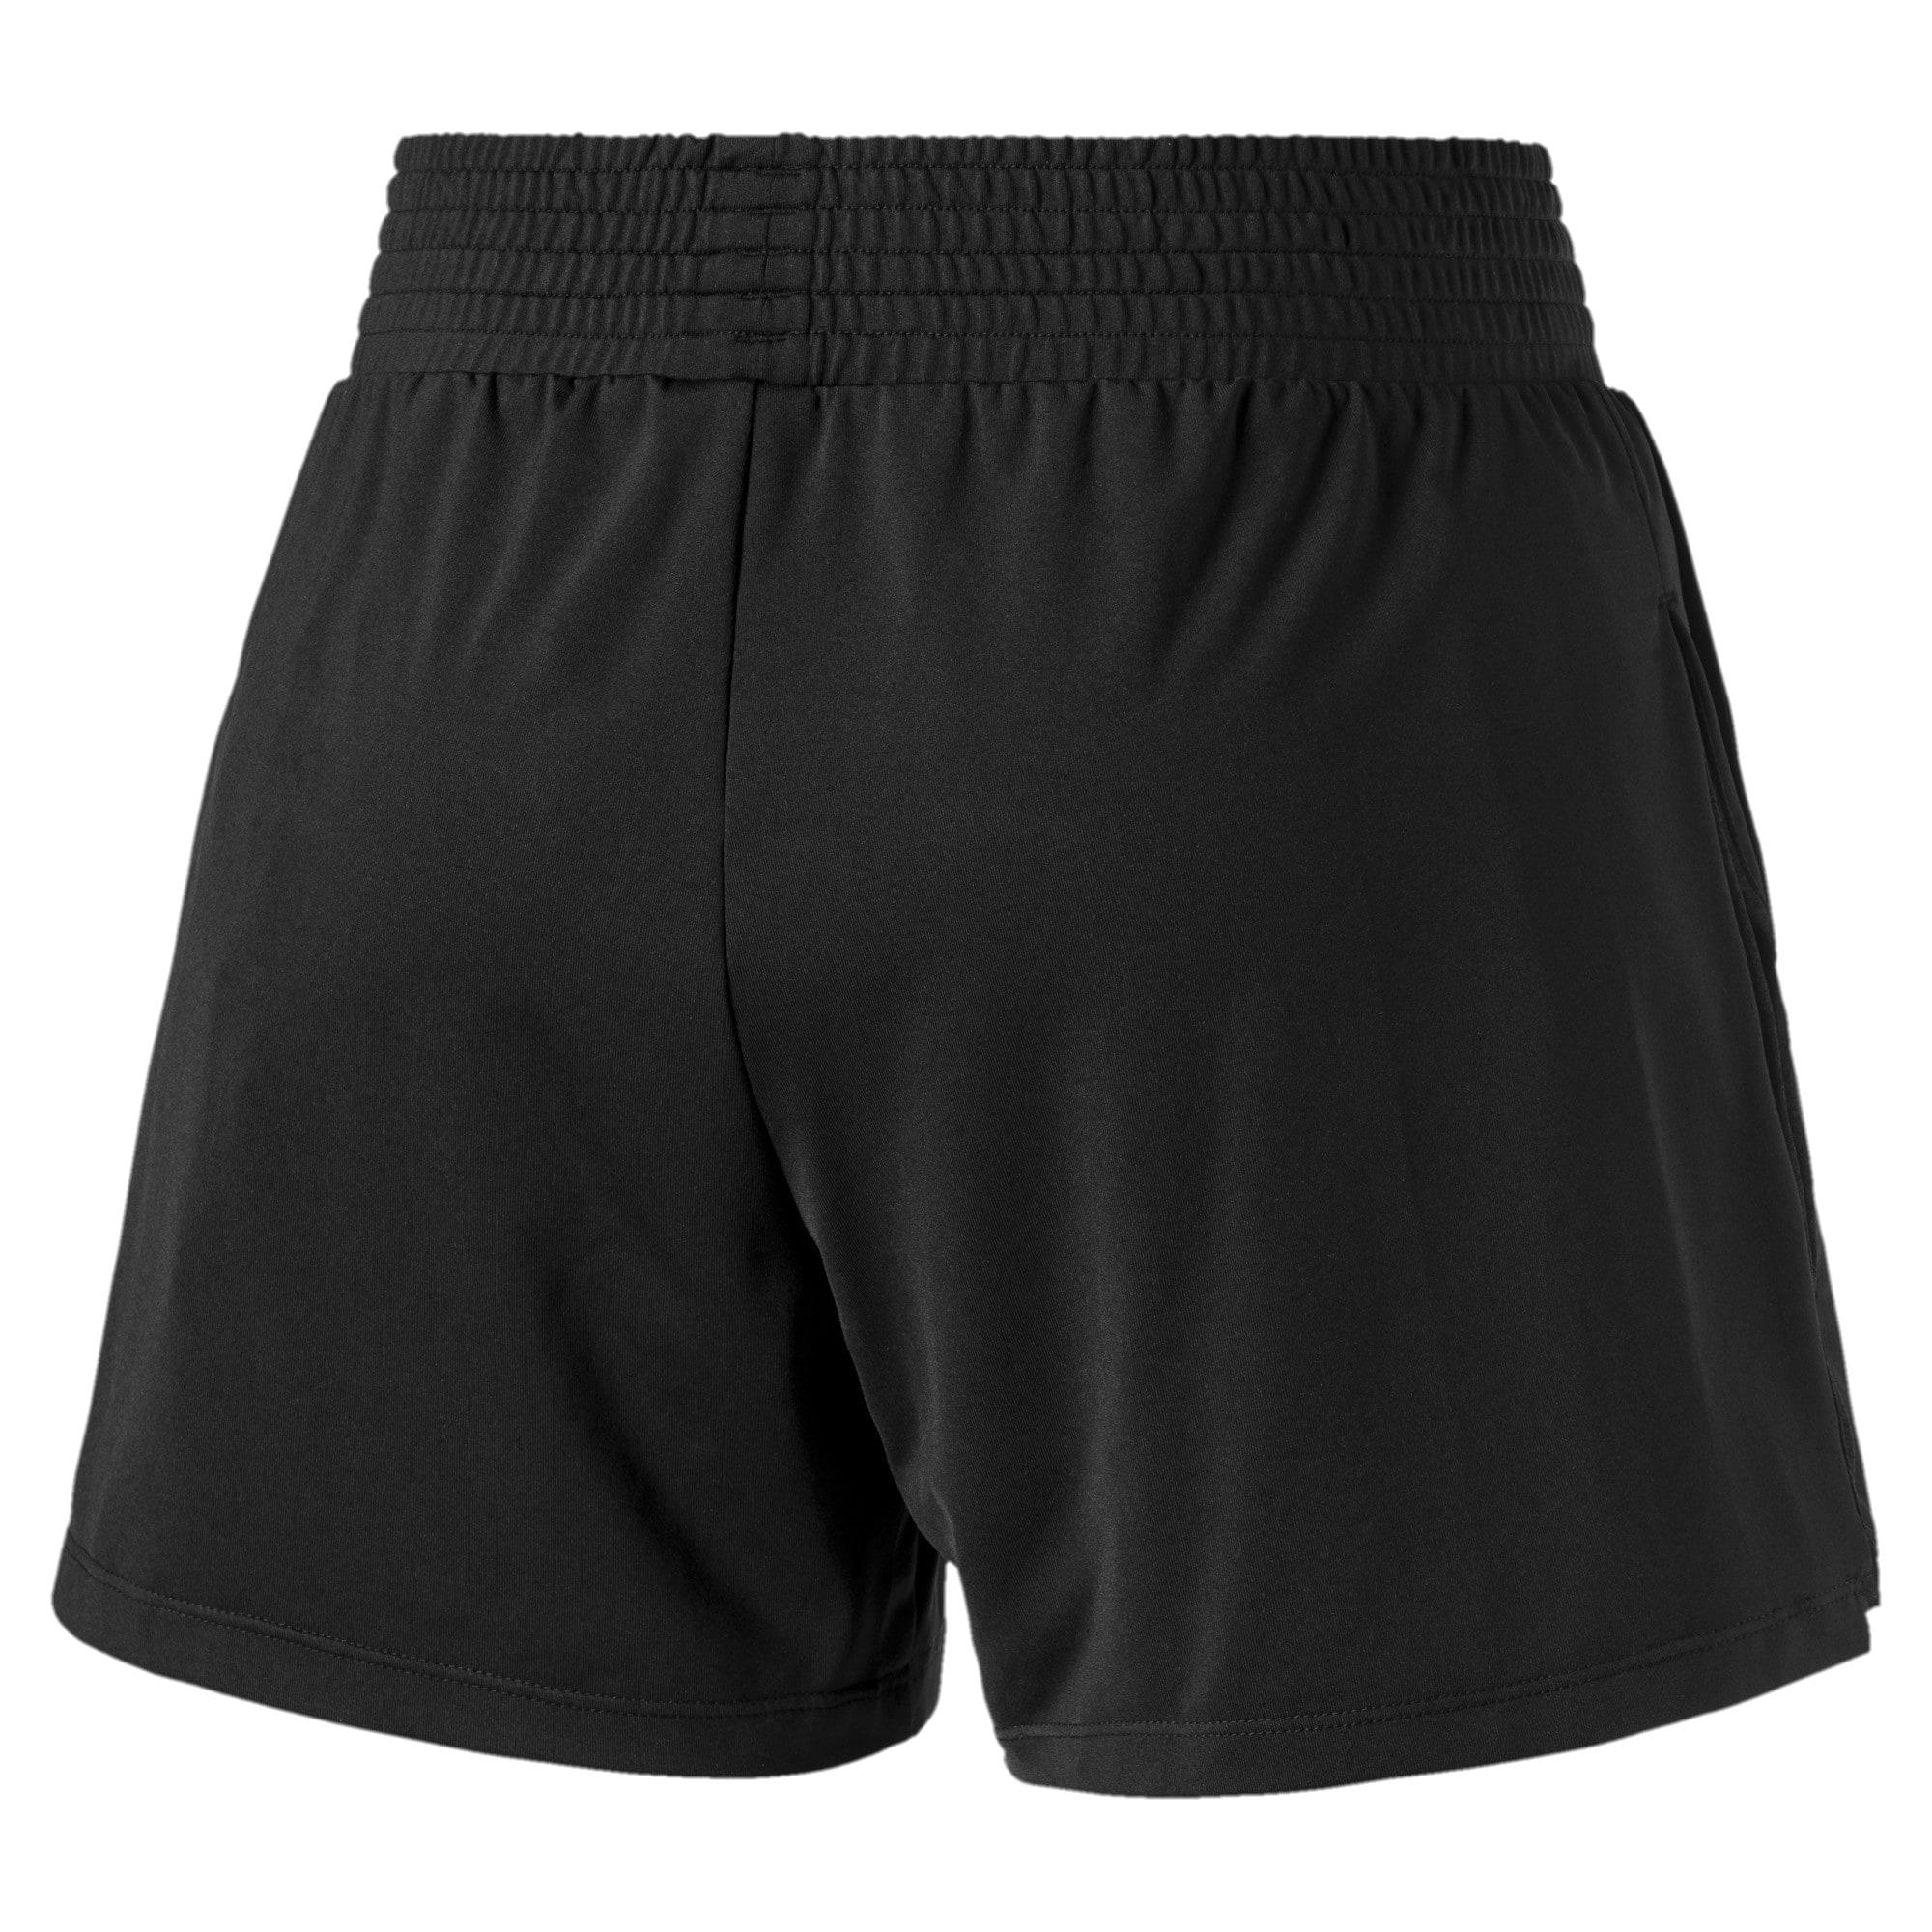 Thumbnail 2 of Soft Sports Women's Shorts, Puma Black, medium